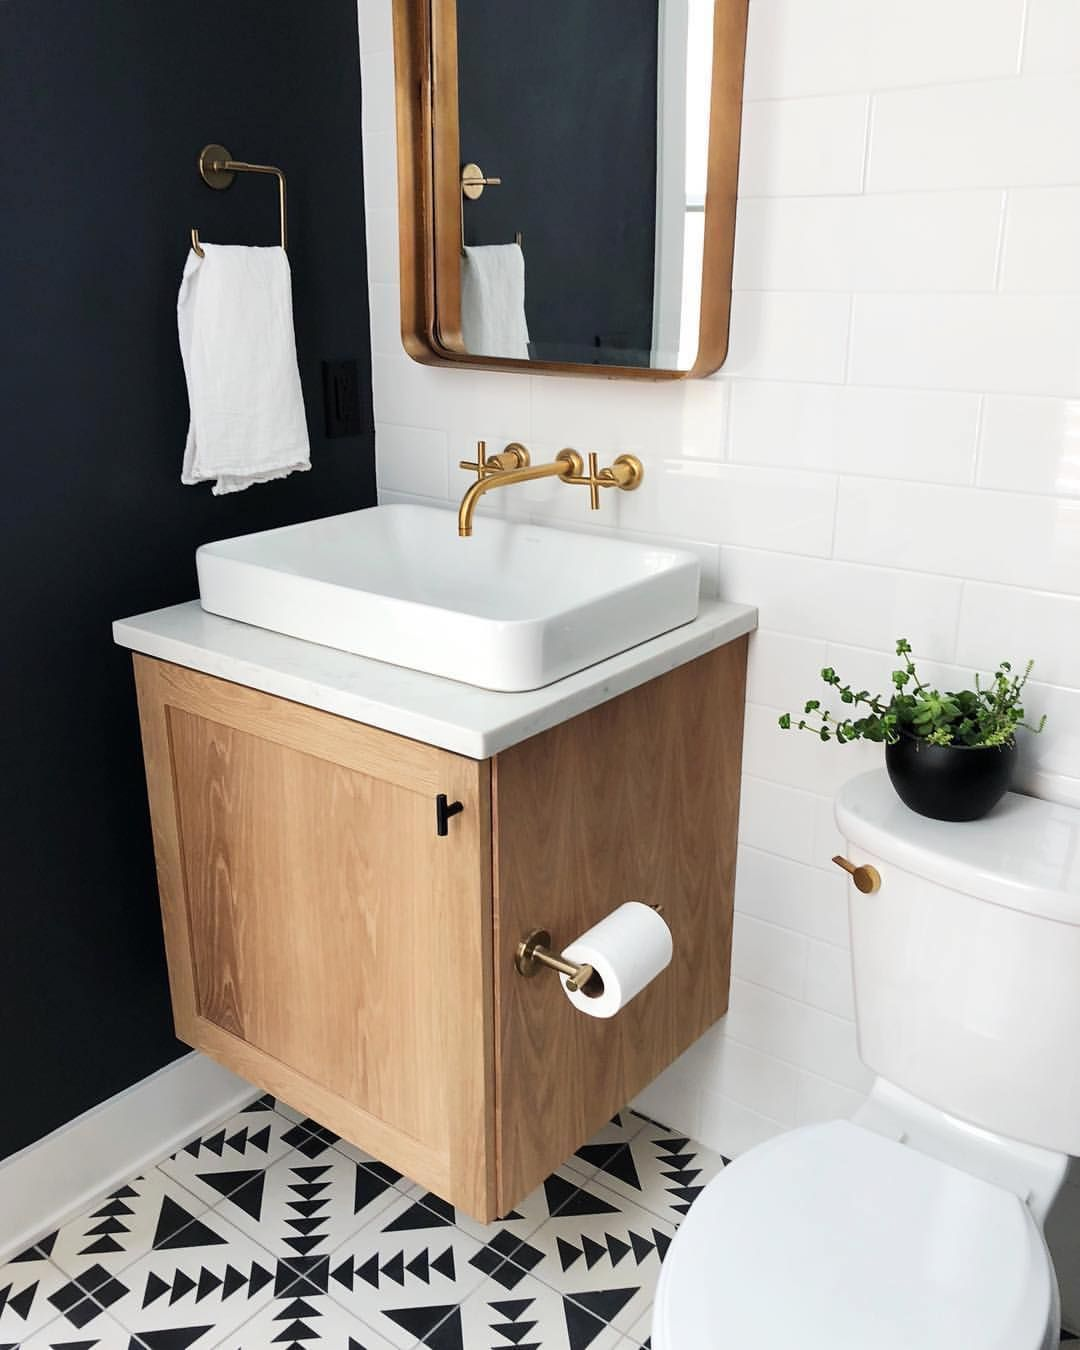 This Sink Salle De Bain En Bas Idee Salle De Bain Salle De